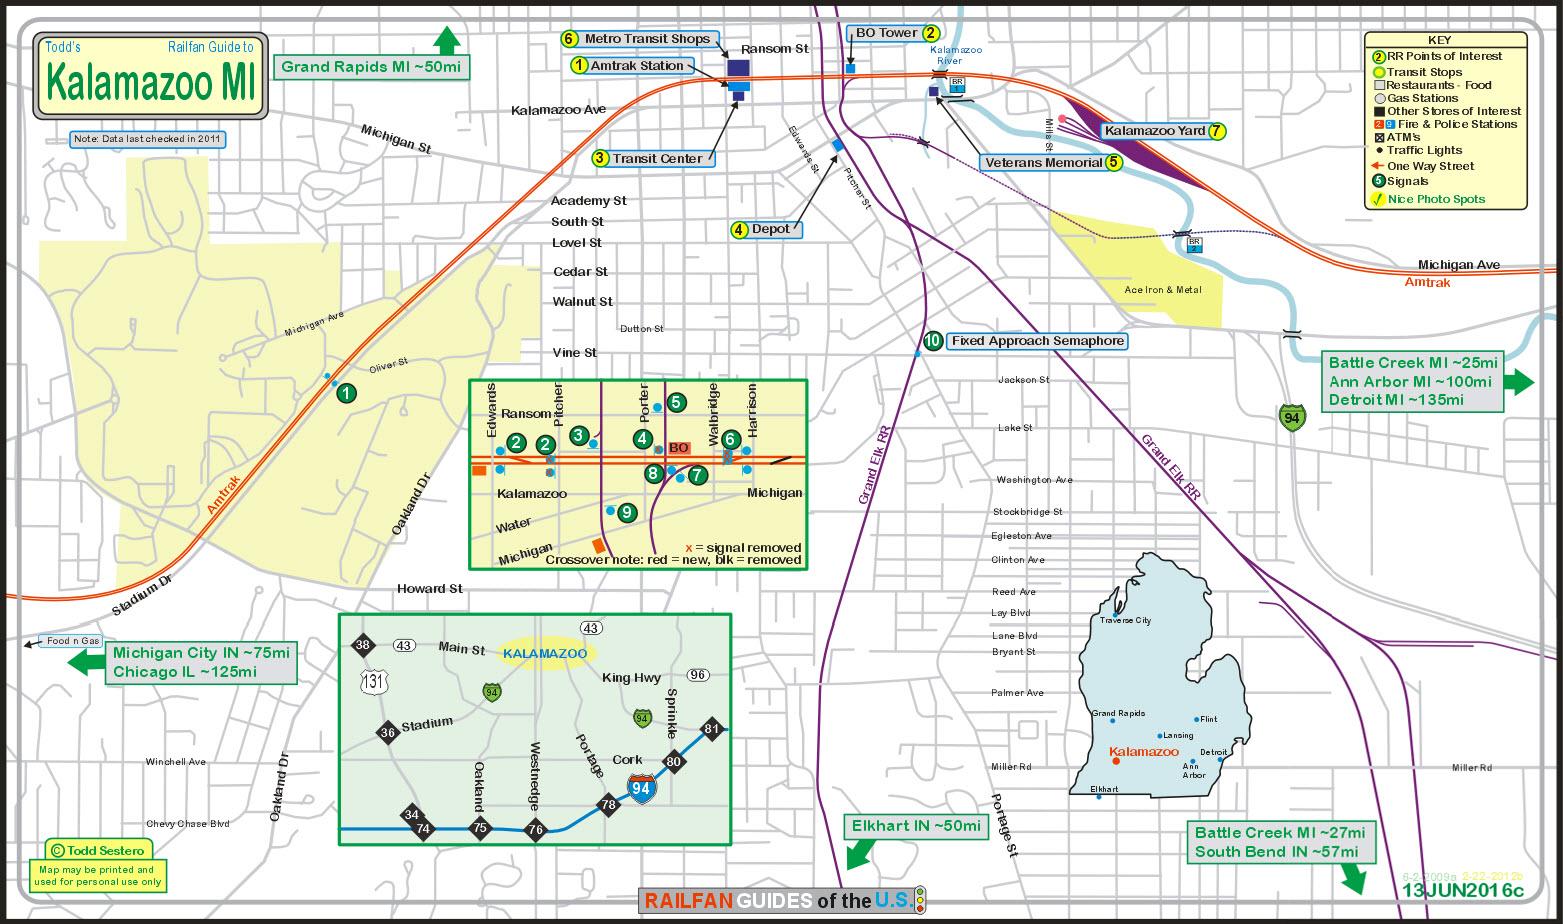 Kalamazoo MI Railfan Guide